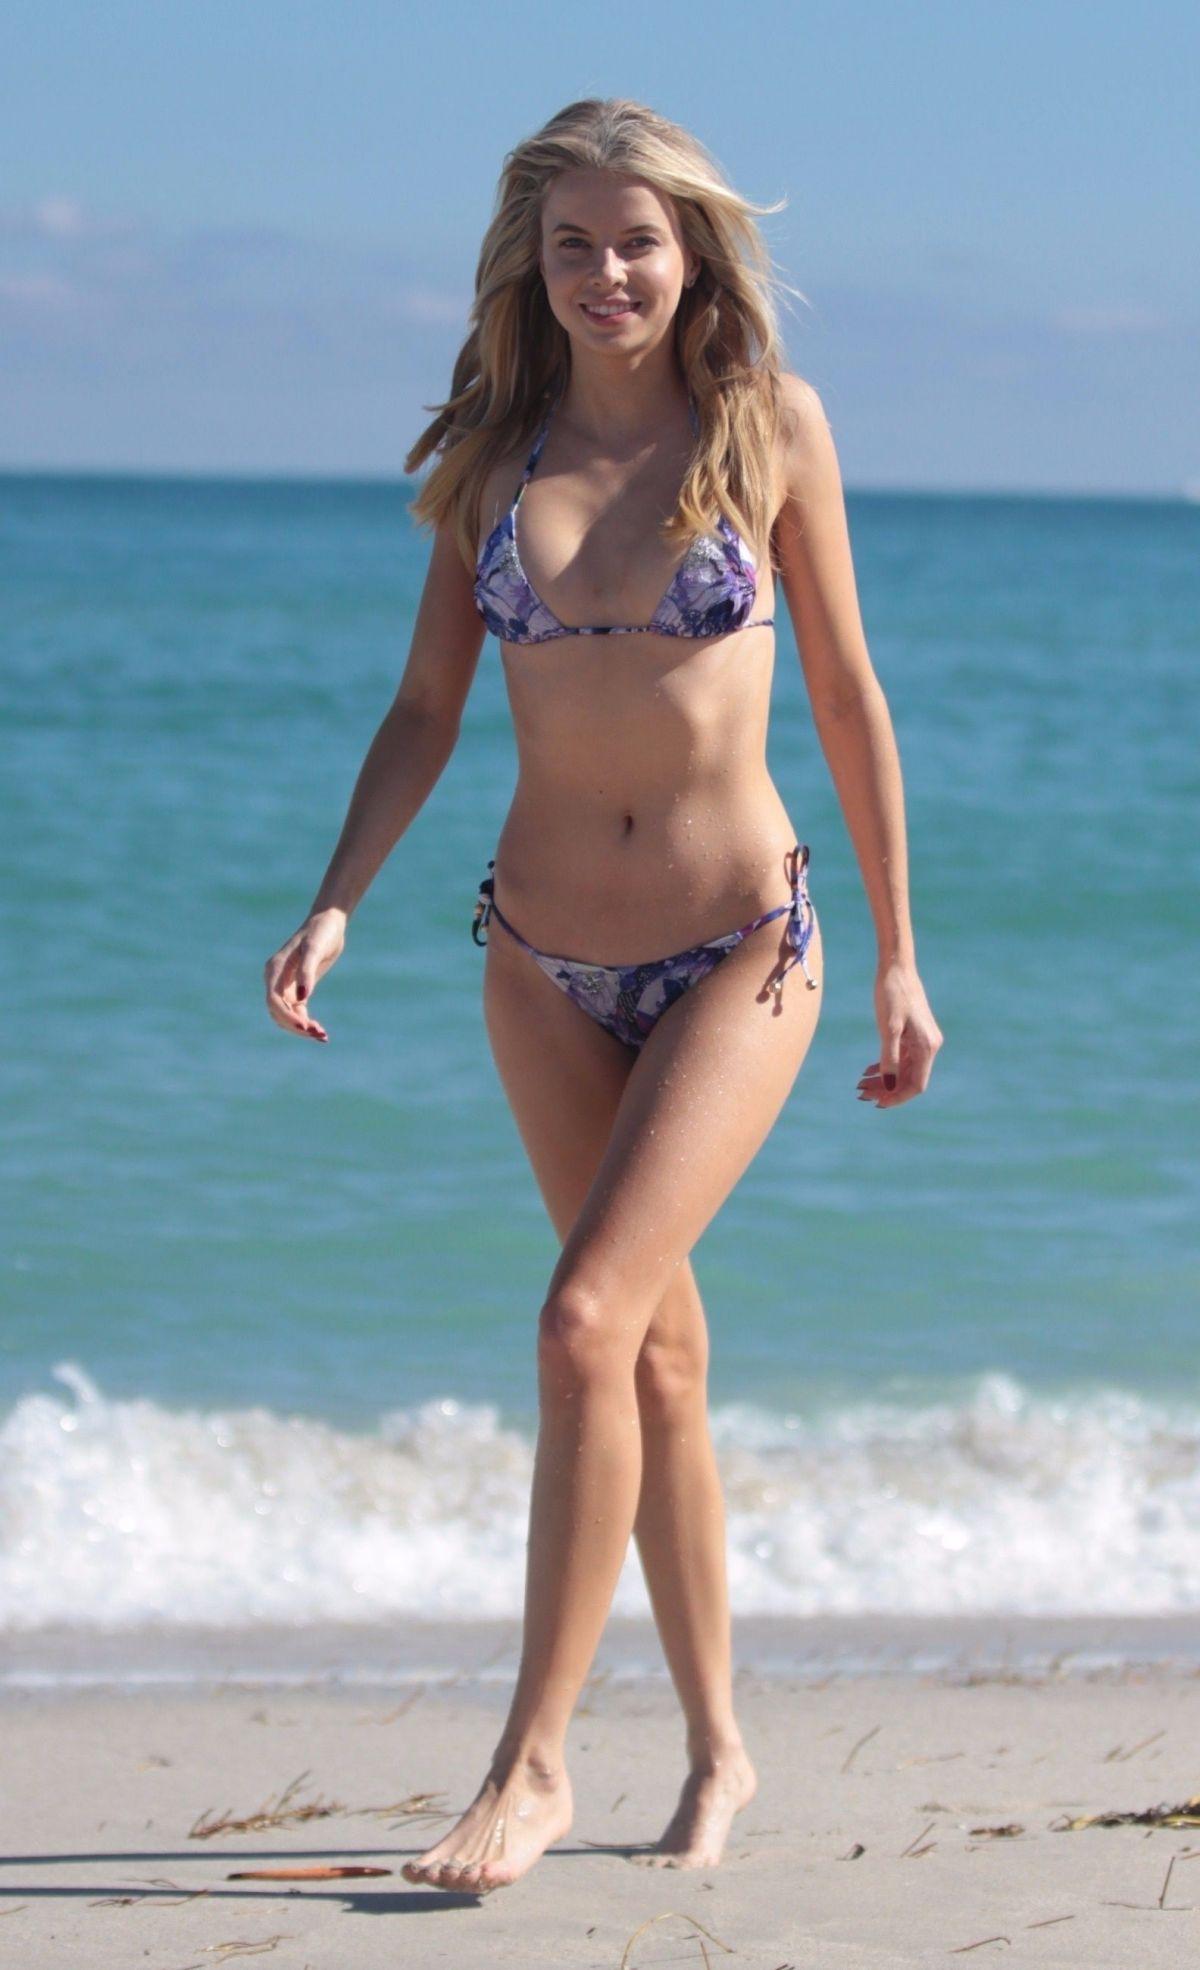 Louisa Warwick in Violet Bikini at the beach in Miami Pic 27 of 35